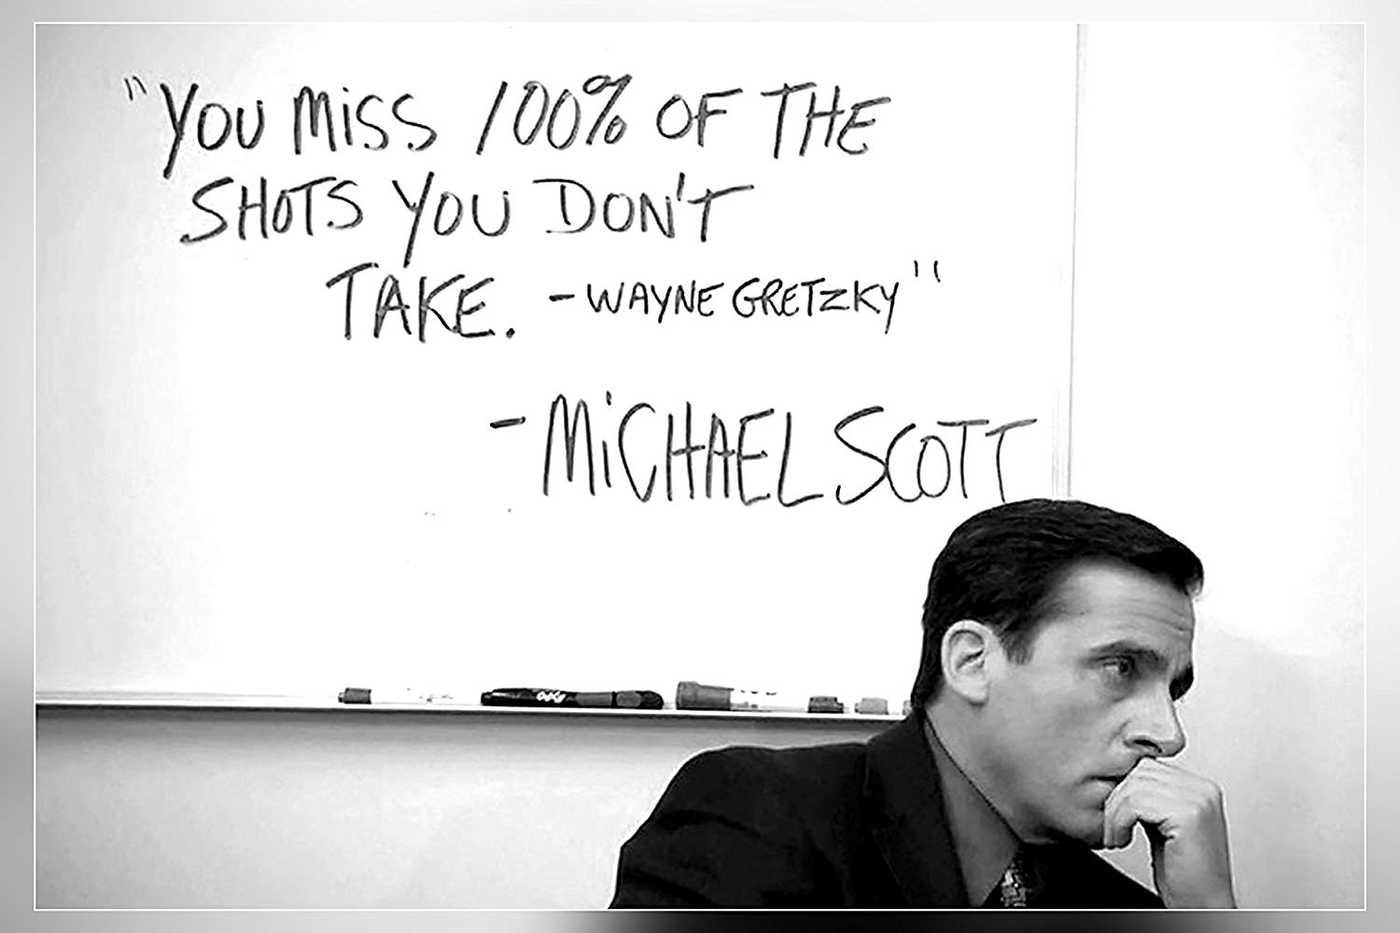 You miss 100% of the shots you don't take -Wayne Gretzky -Michael Scott